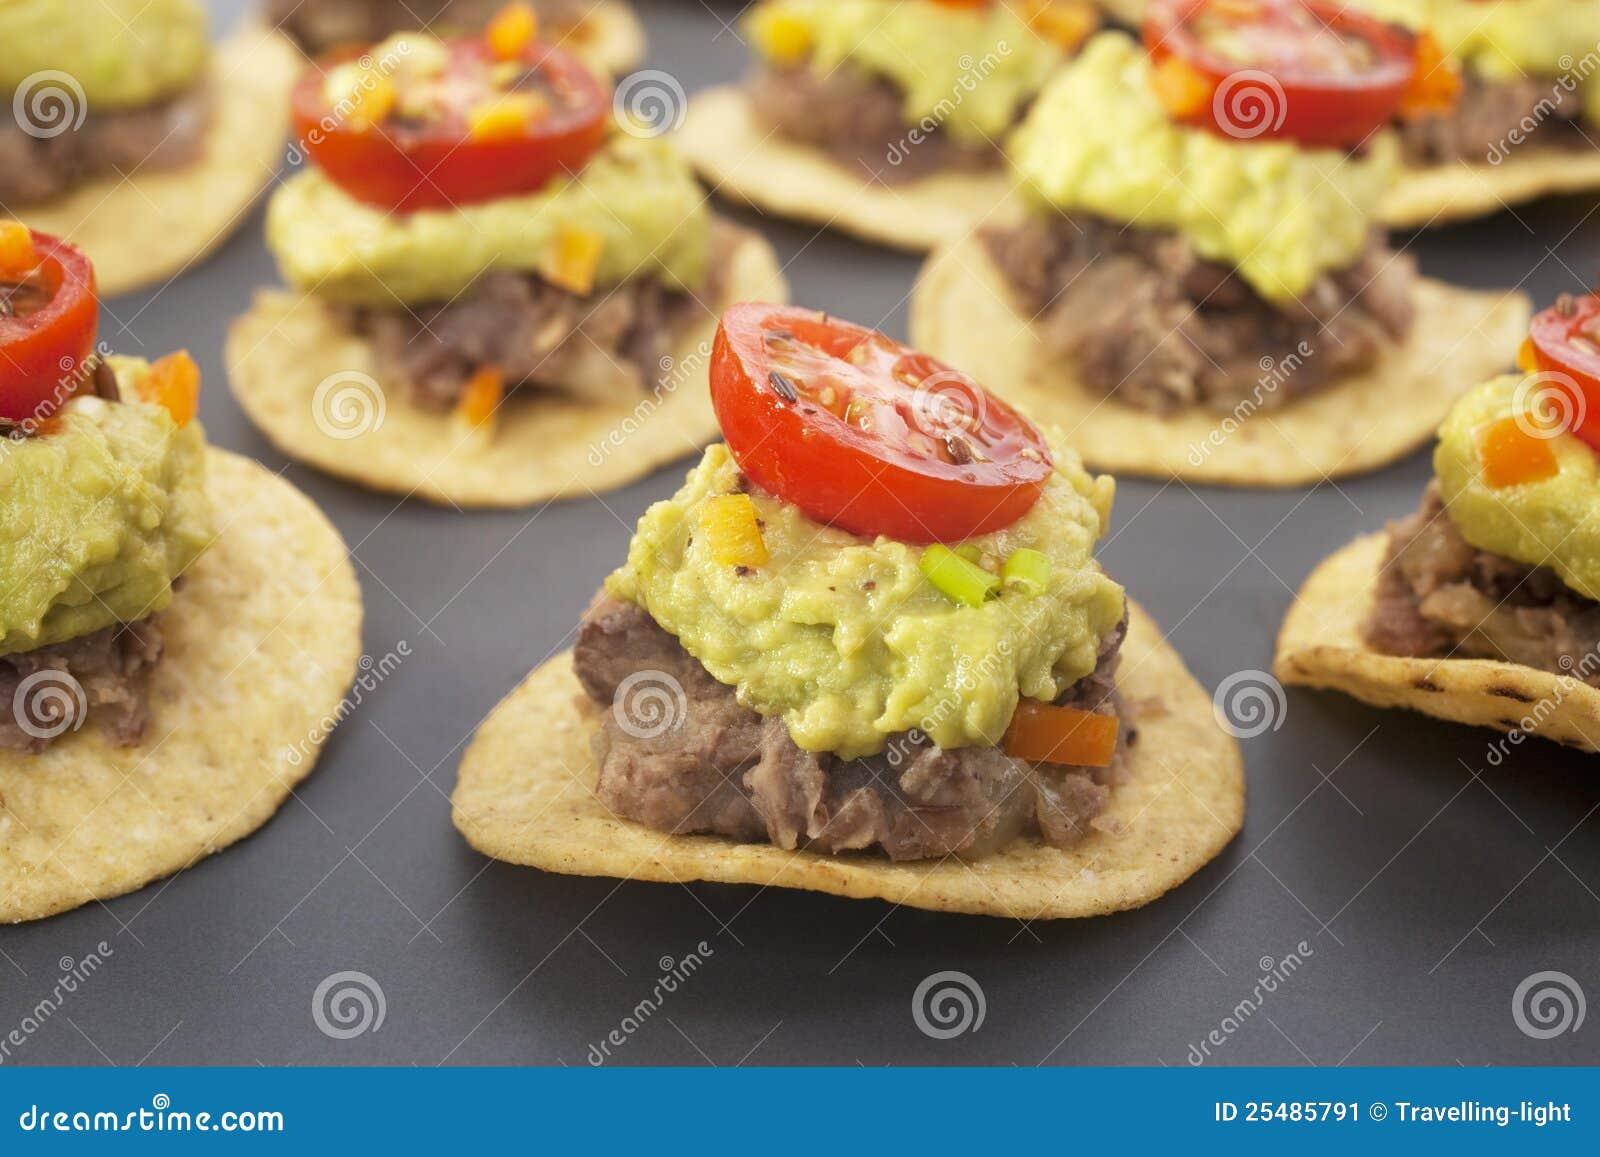 Mexican Bites Nachos Appetiser Finger Food Stock Image - Image ...